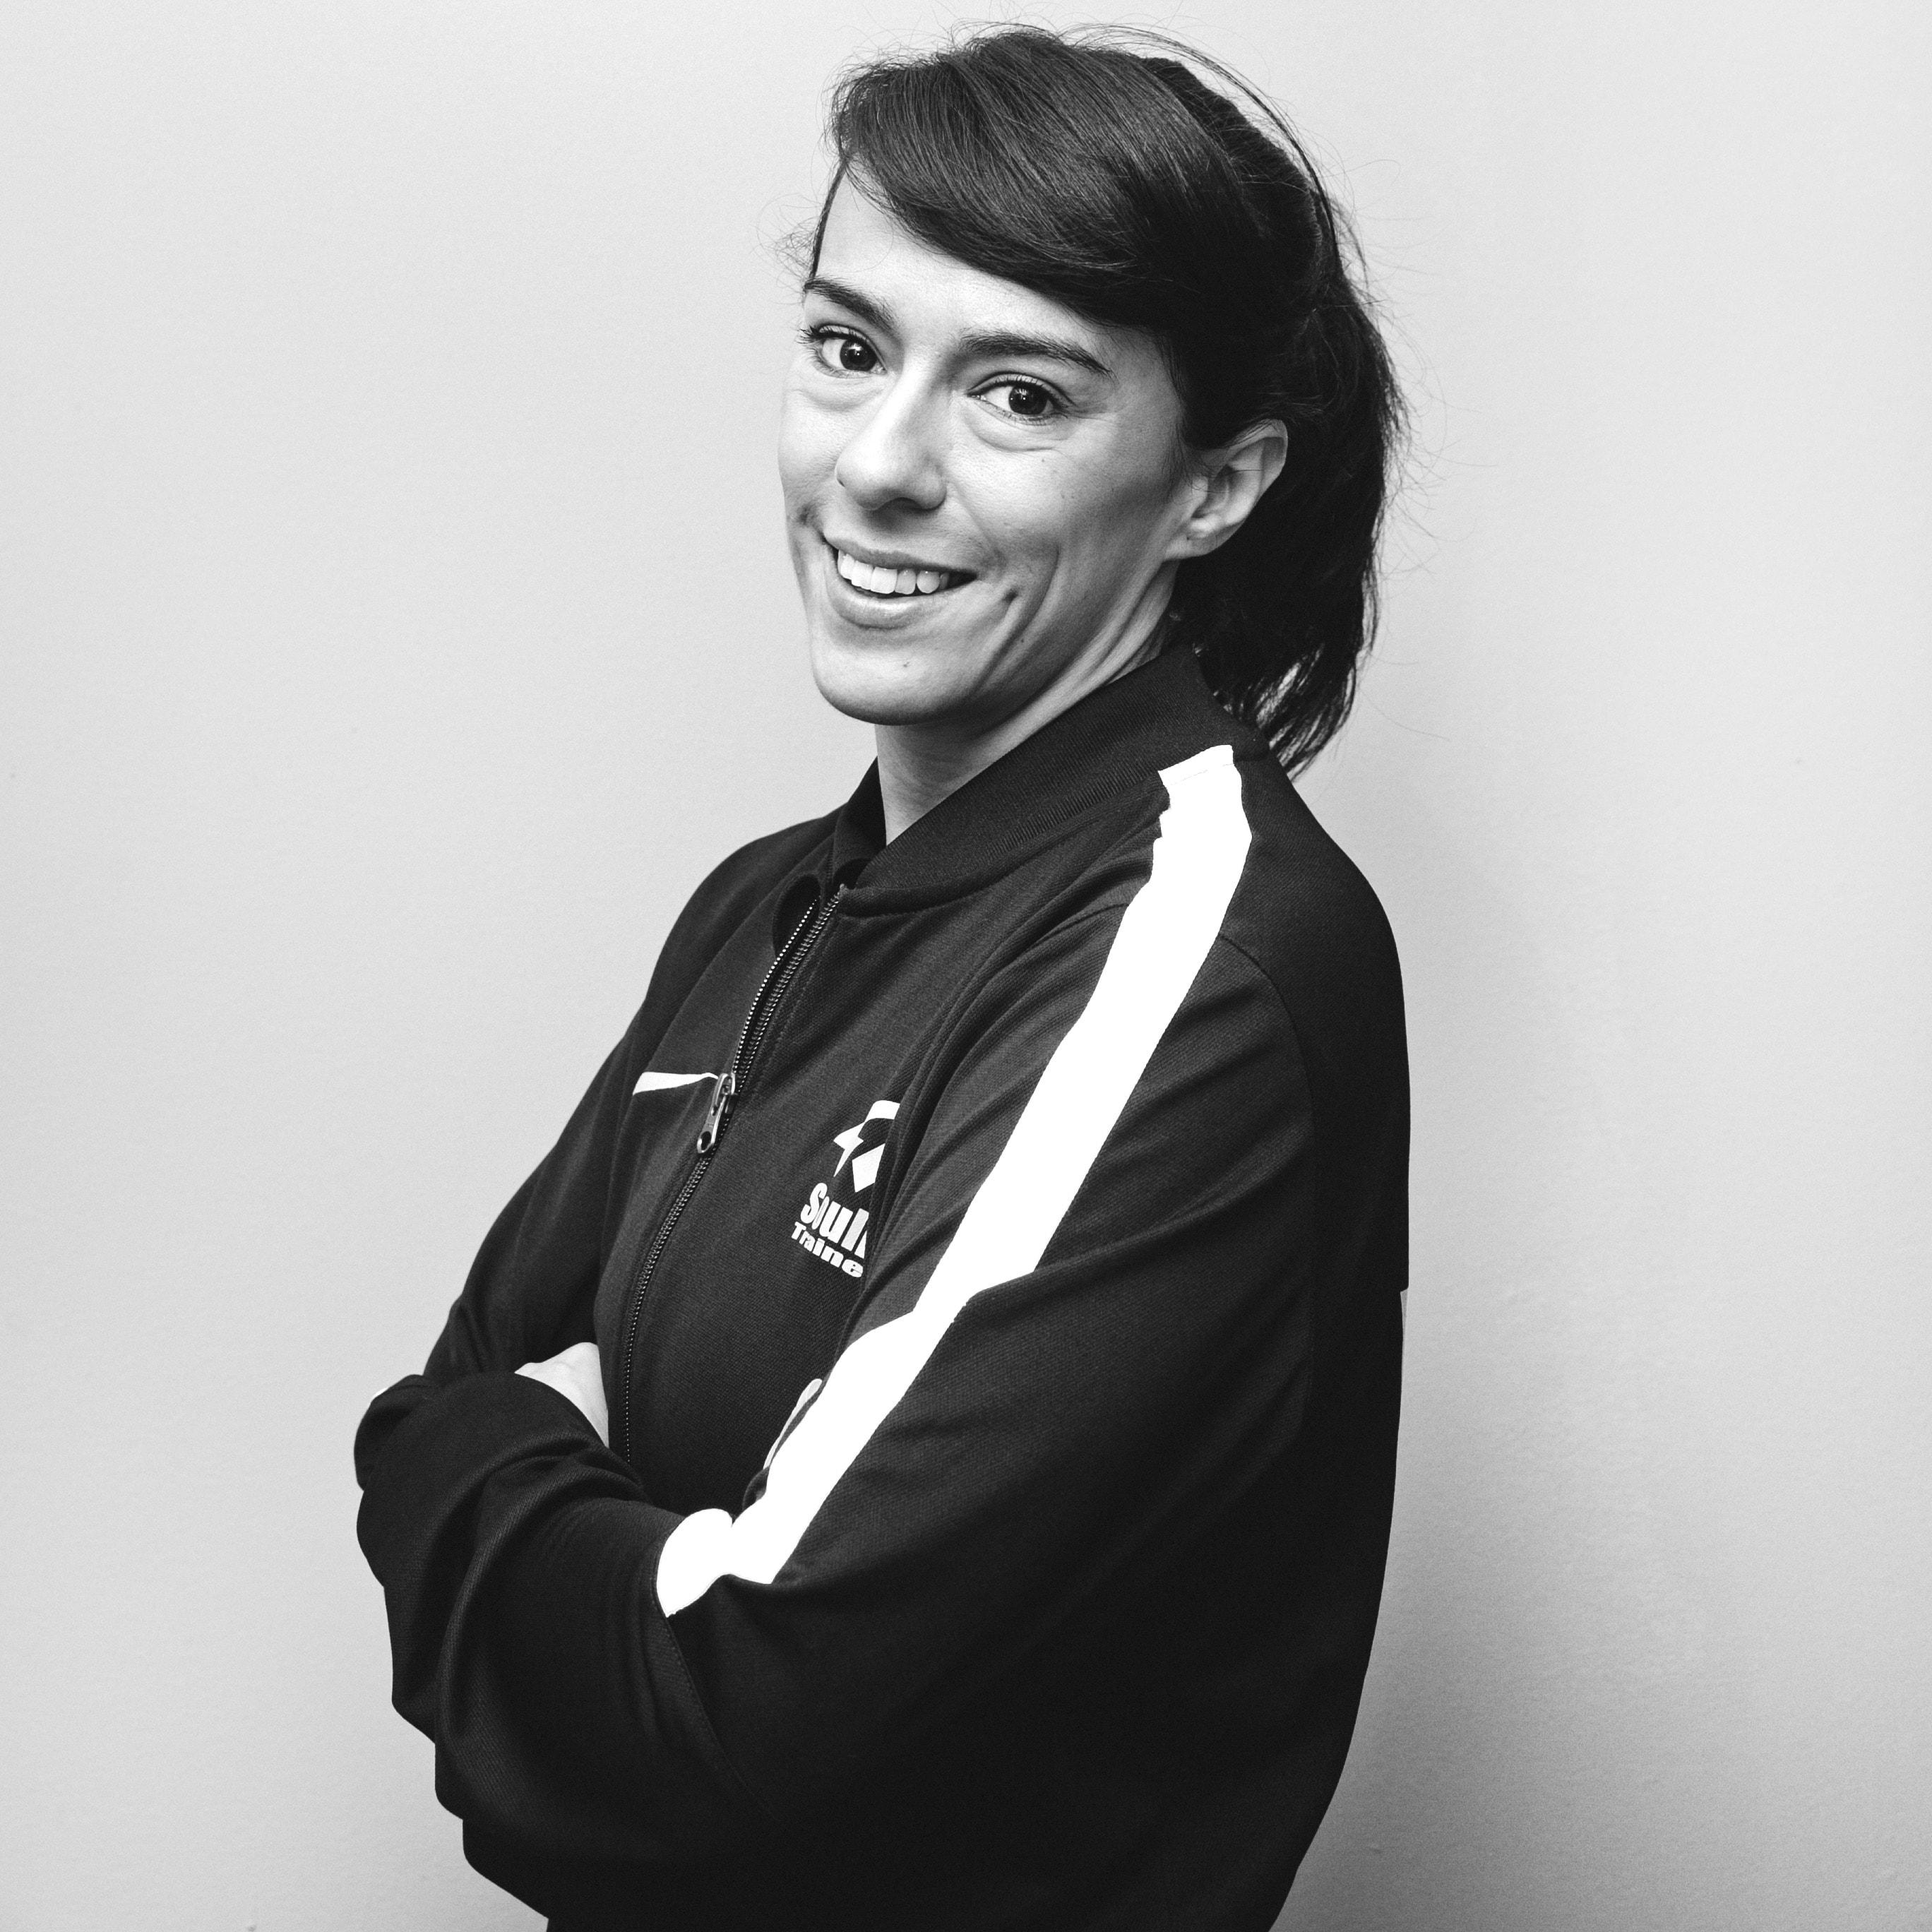 Diana-entrenadora-personal